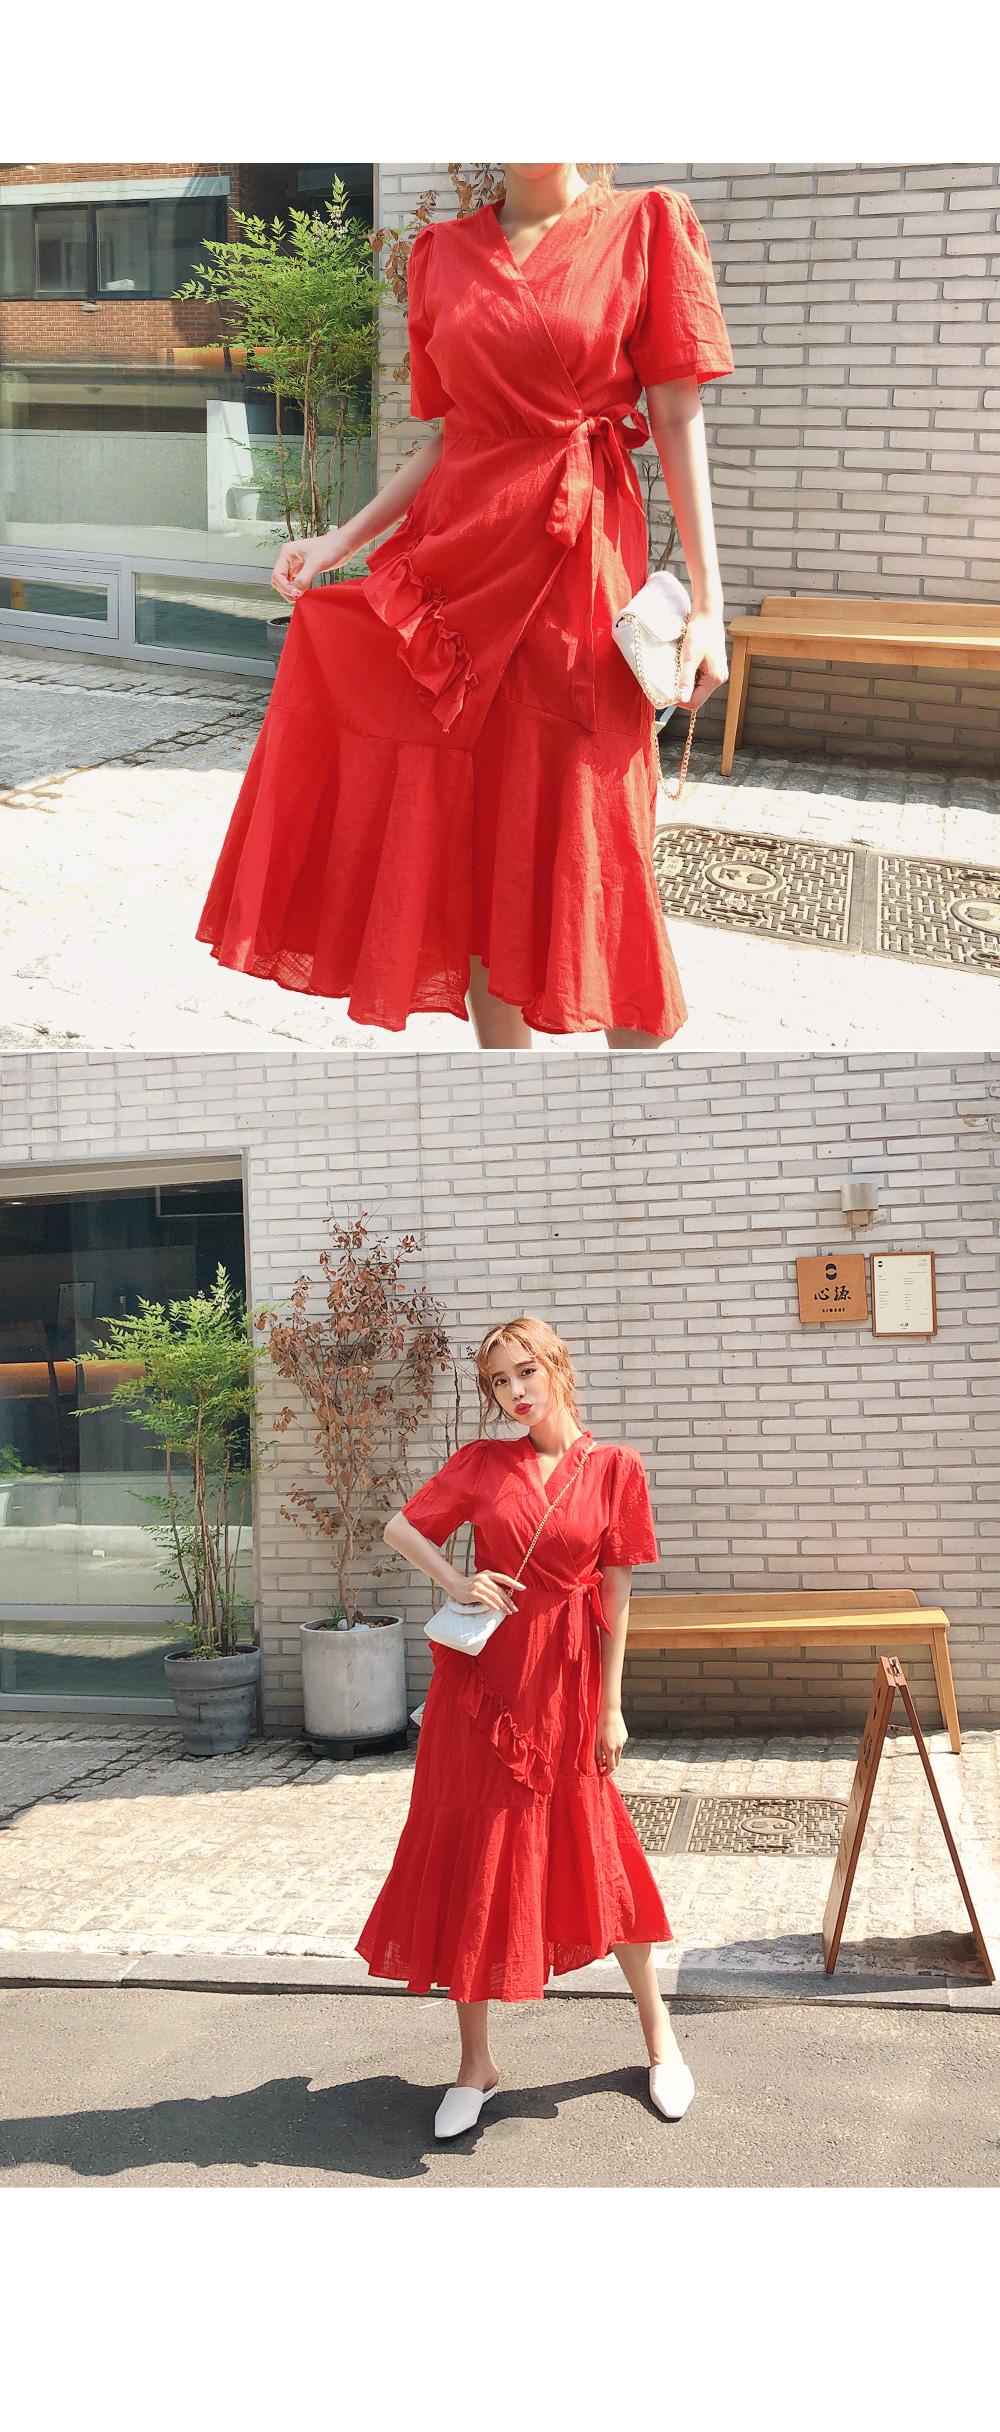 Fascinating ruffle dress